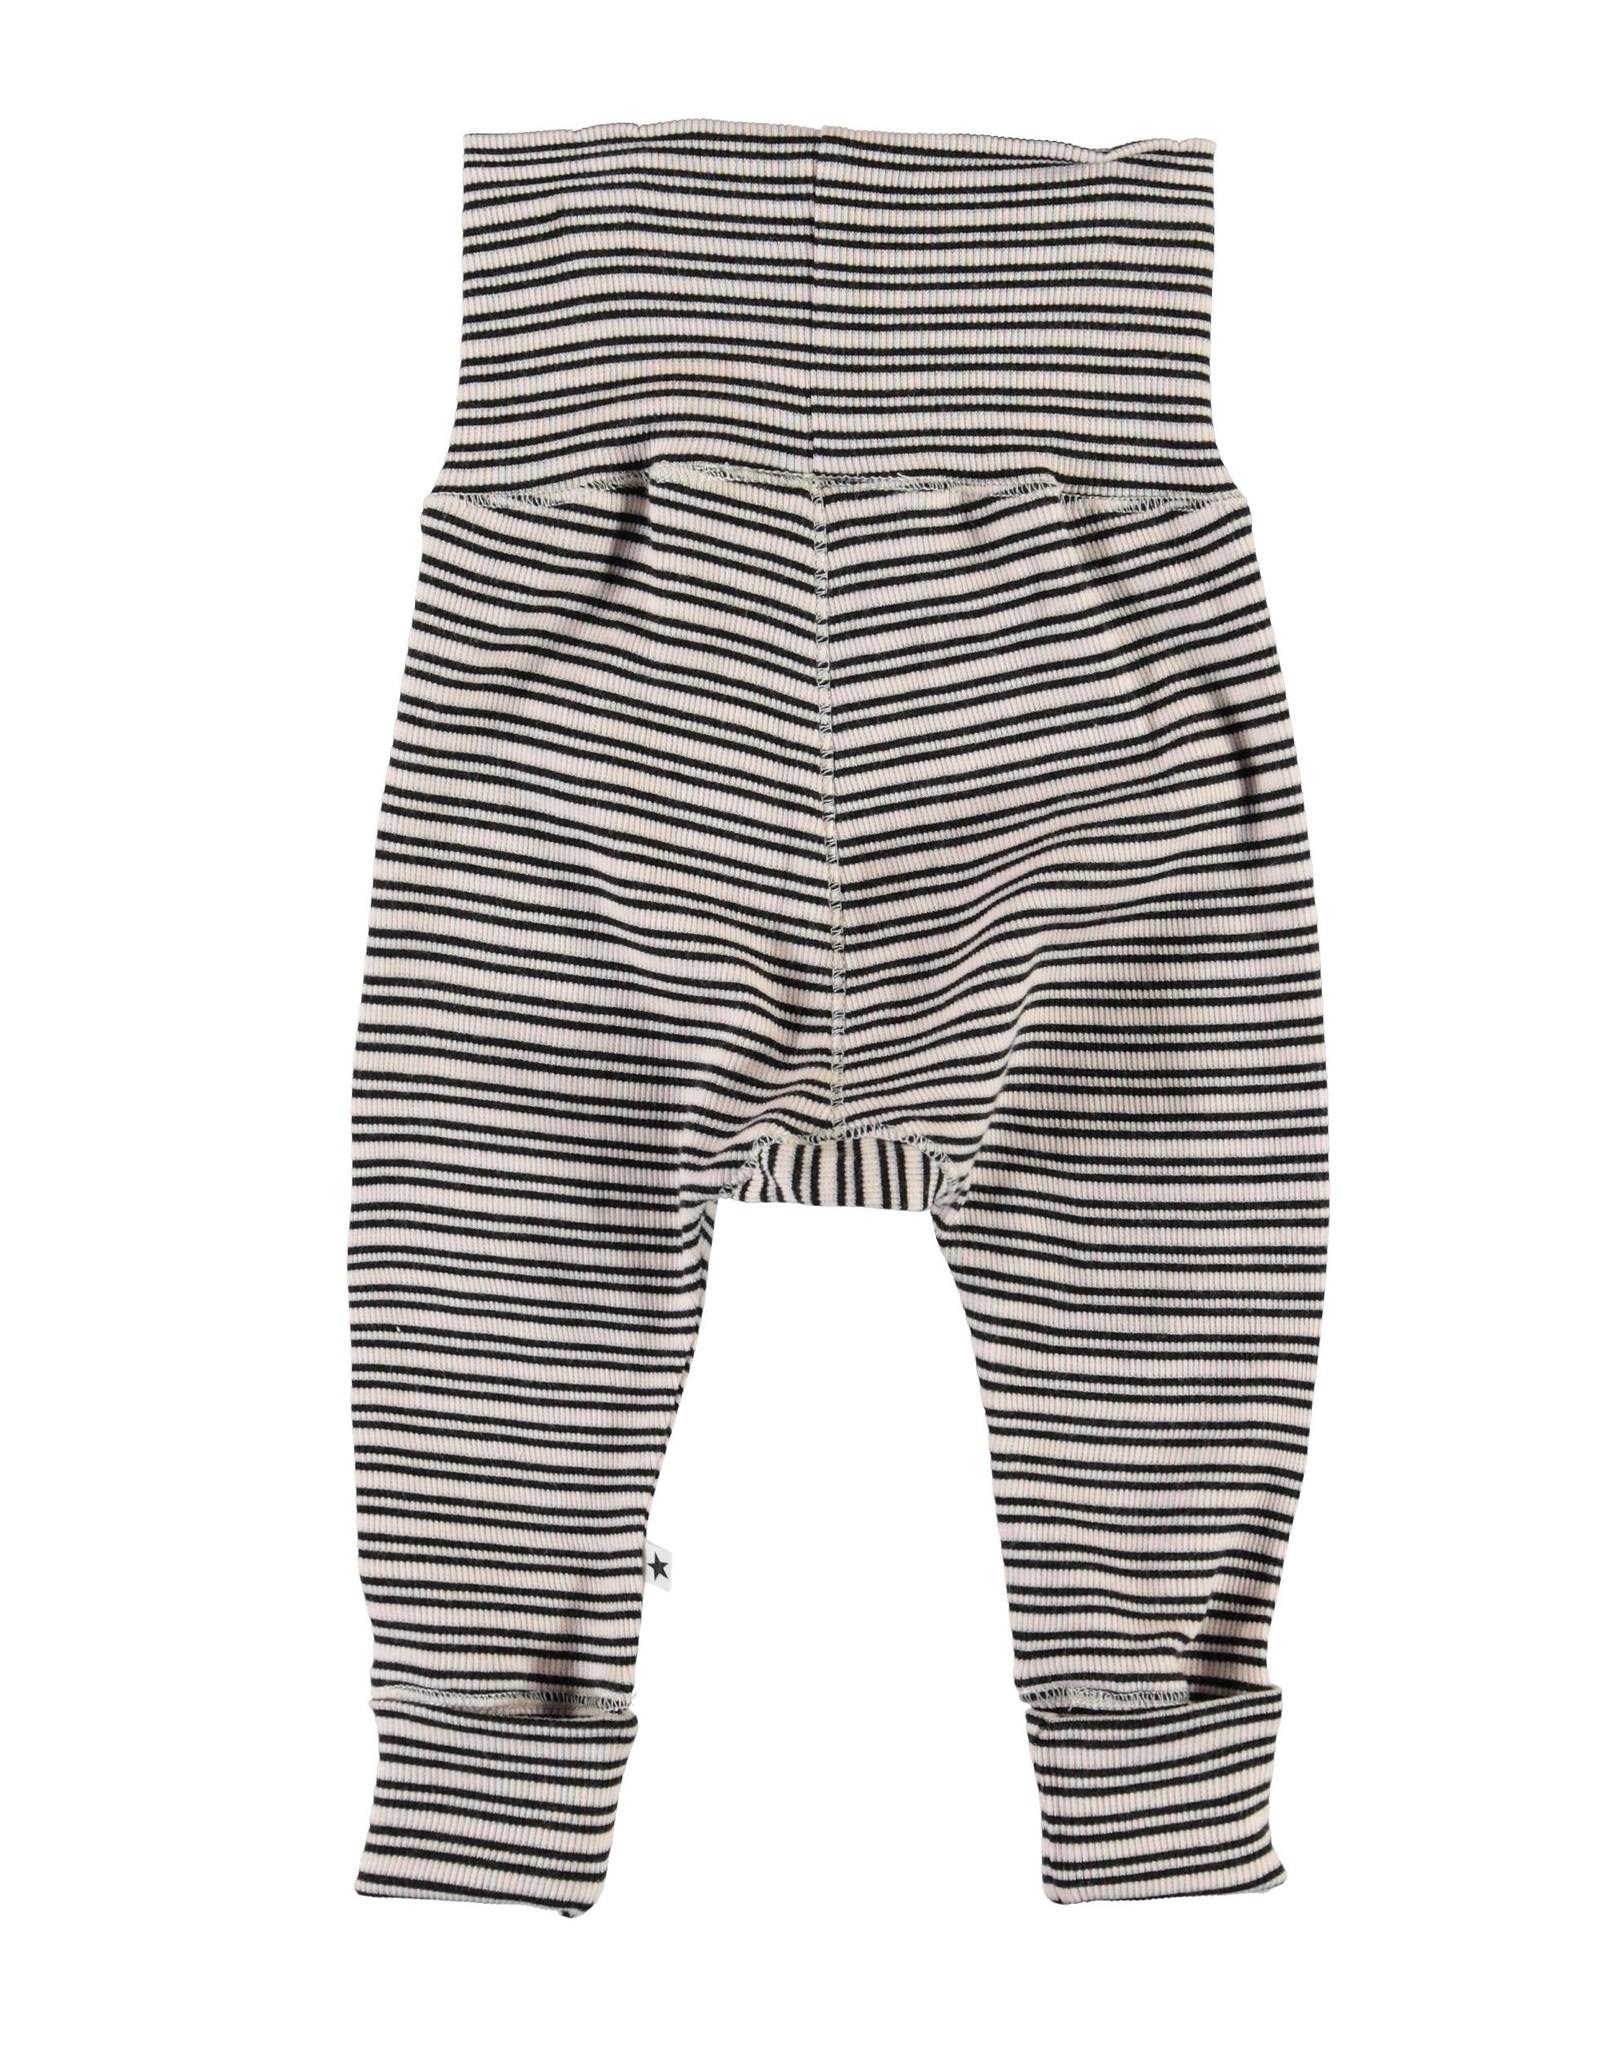 Molo Sara Blossom Black Stripe Pants